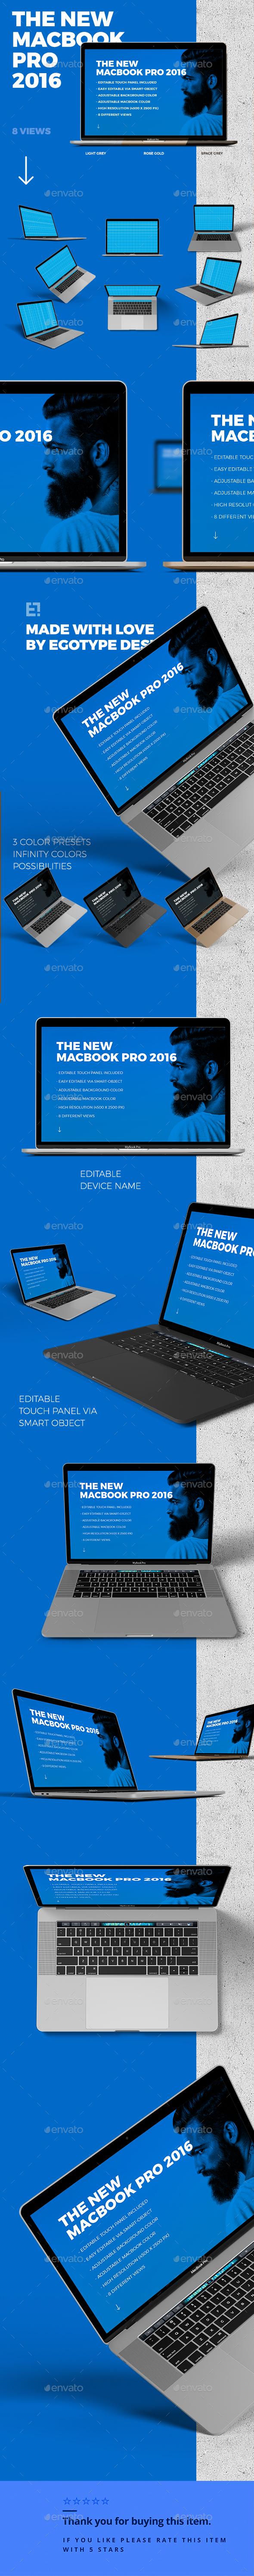 MacBook 2016 Mockup - Laptop Displays